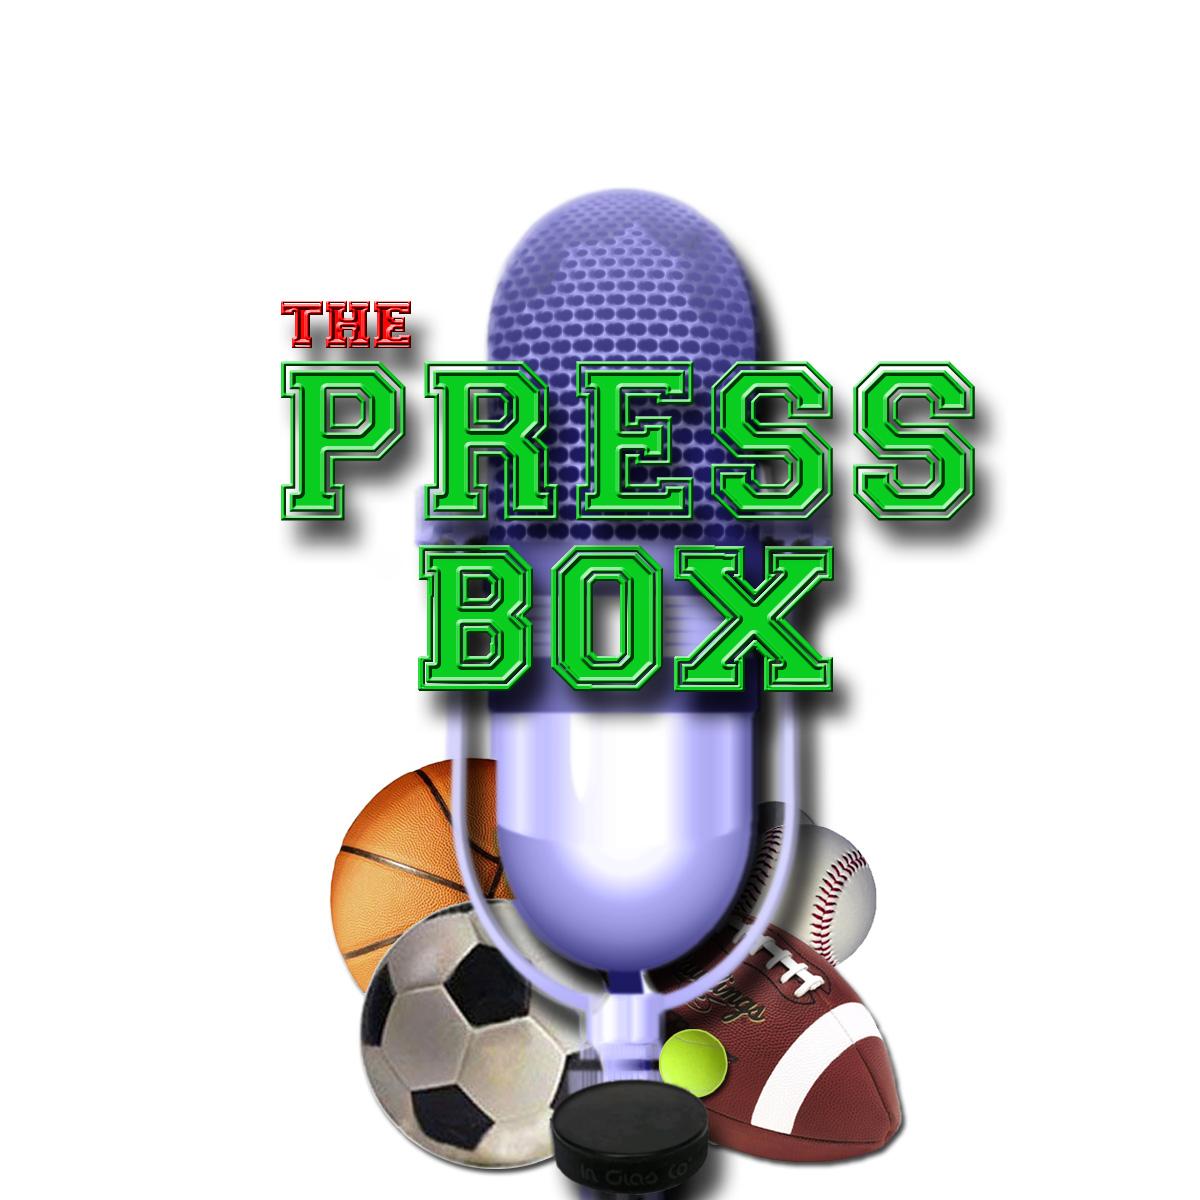 PRESS BOX SPORTS EMPORIUM INC